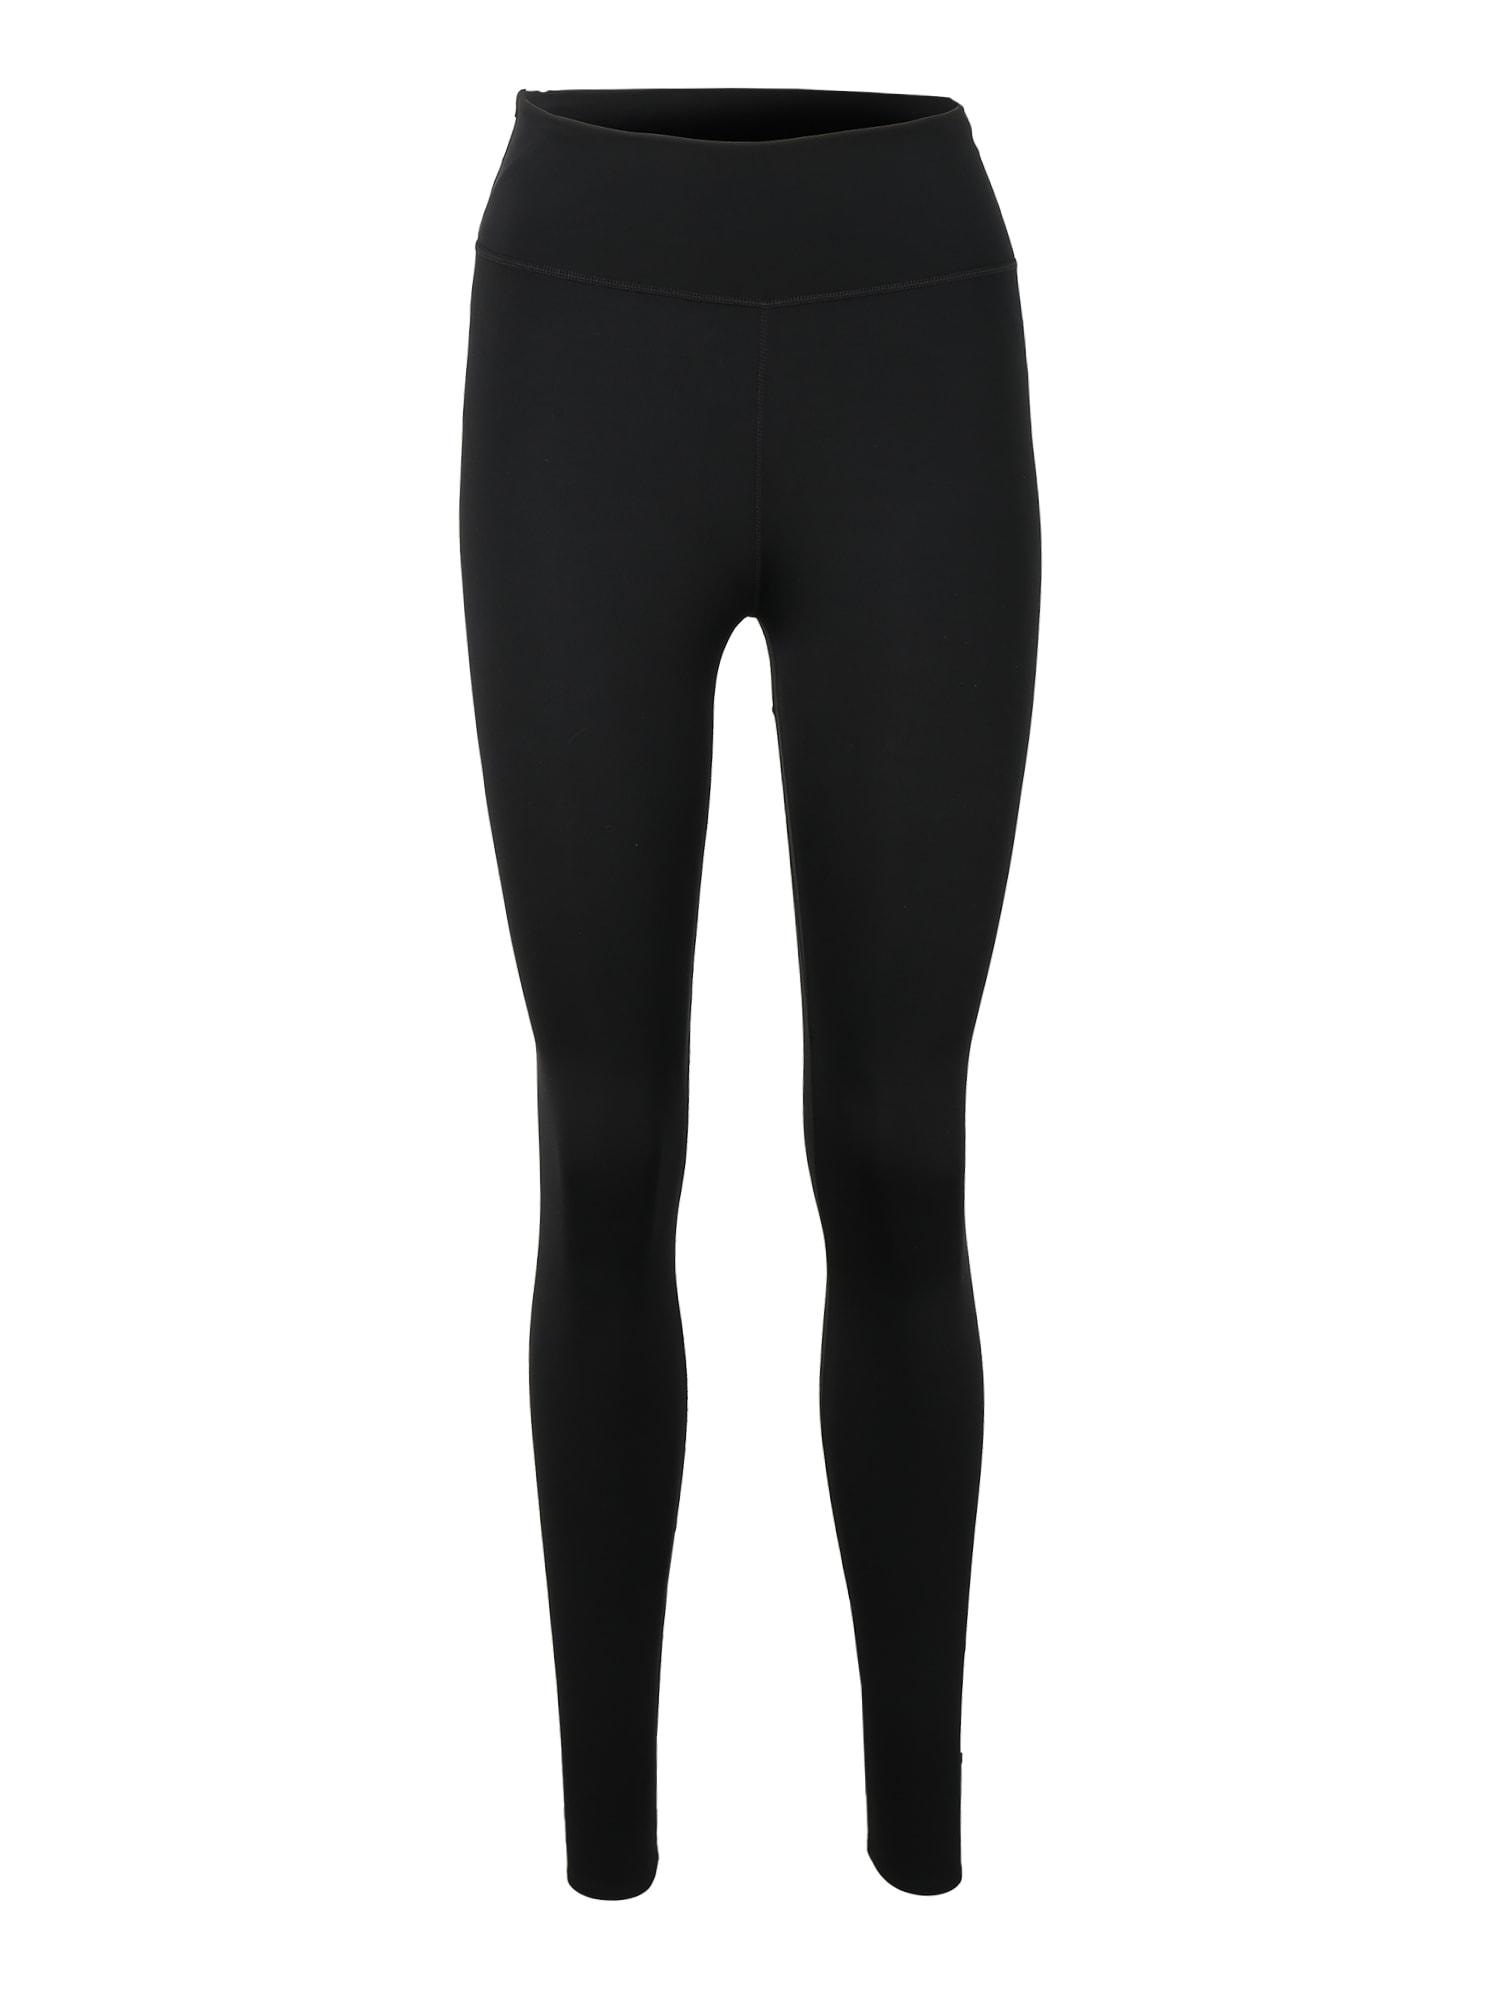 NIKE Športové nohavice 'One Luxe'  čierna